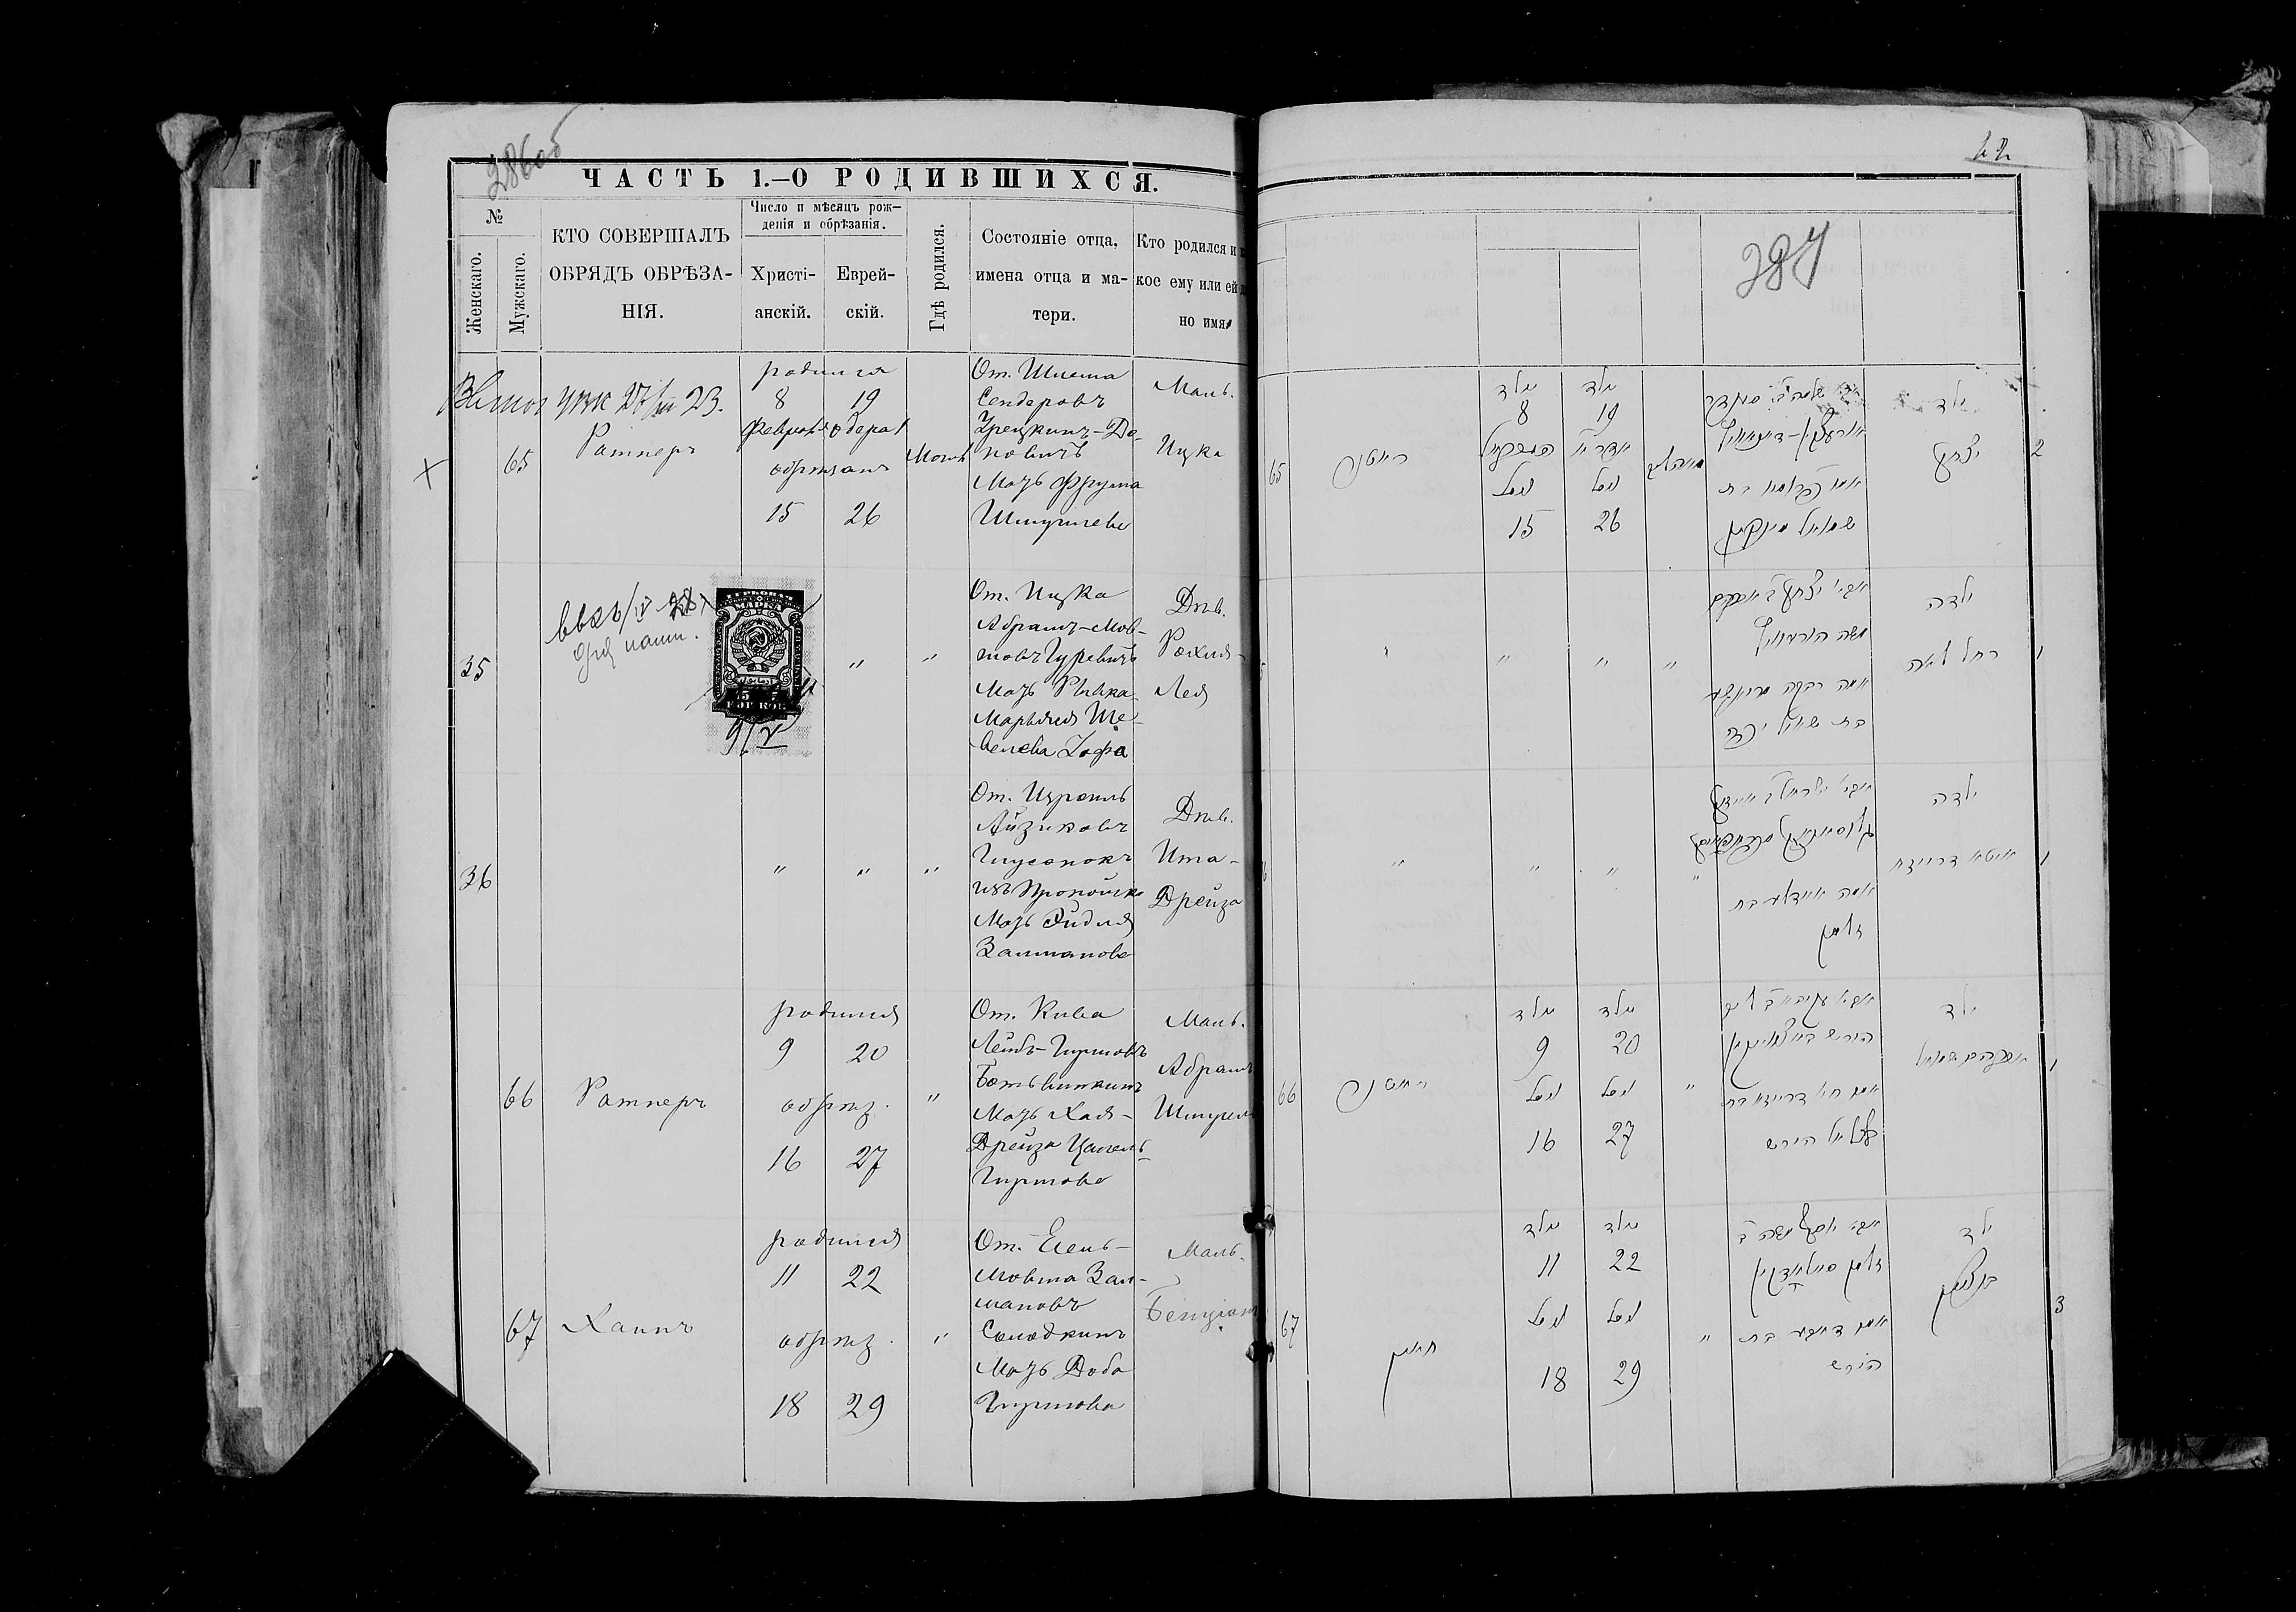 Ита-Дрейза Глусонок 15 февраля 1889, запись 36, пленка 007766484, снимок 135